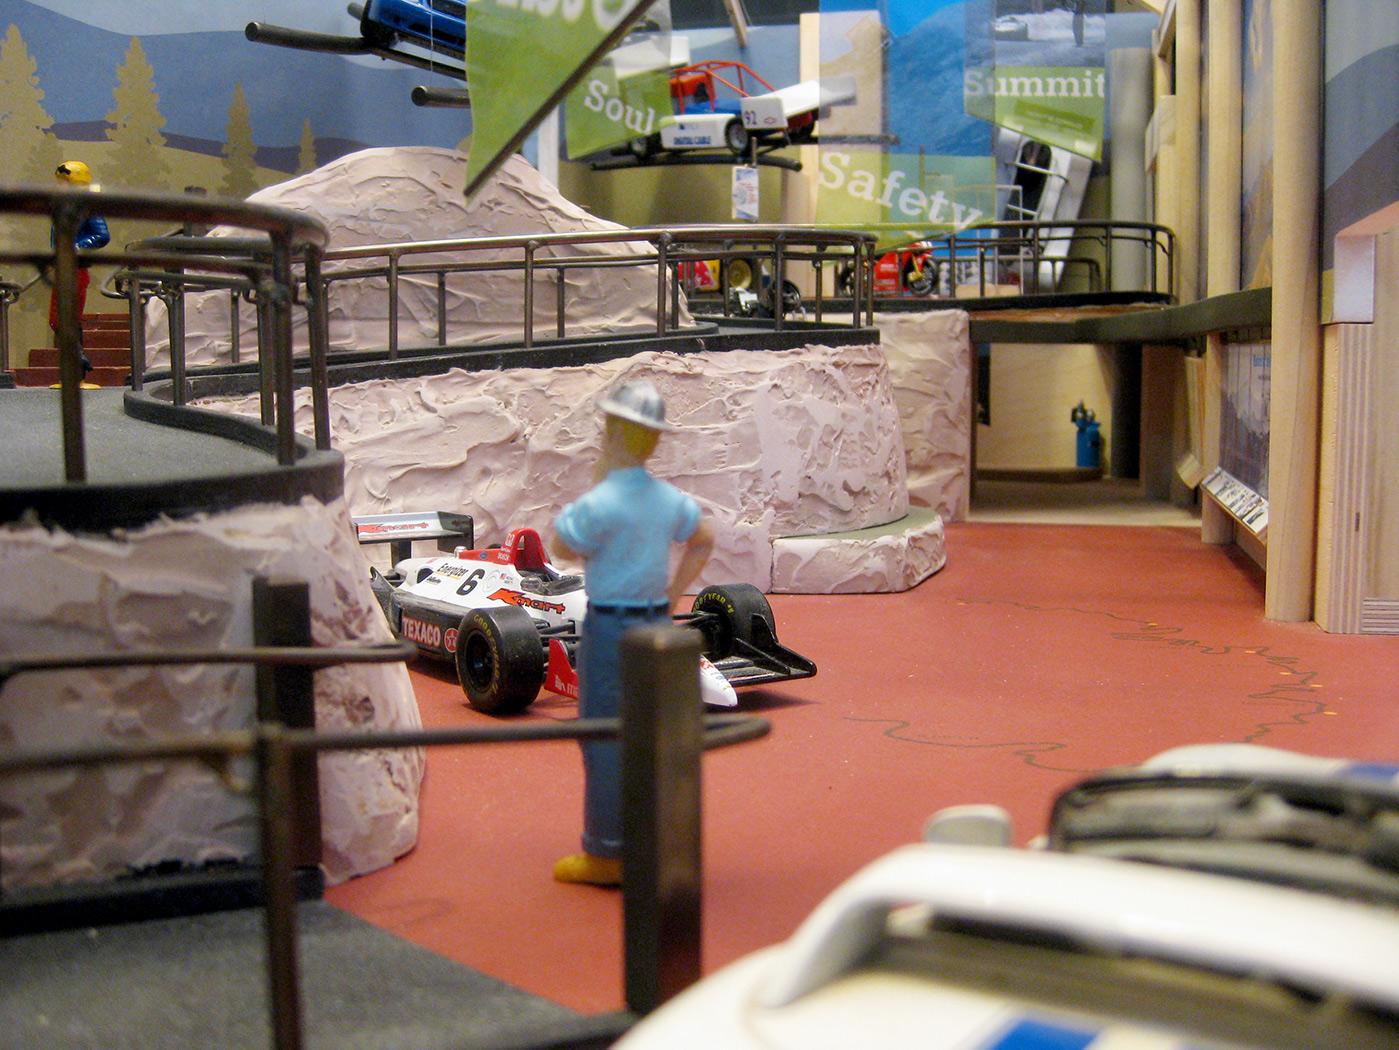 Pikes Peak Hill Climb Experience Museum model making